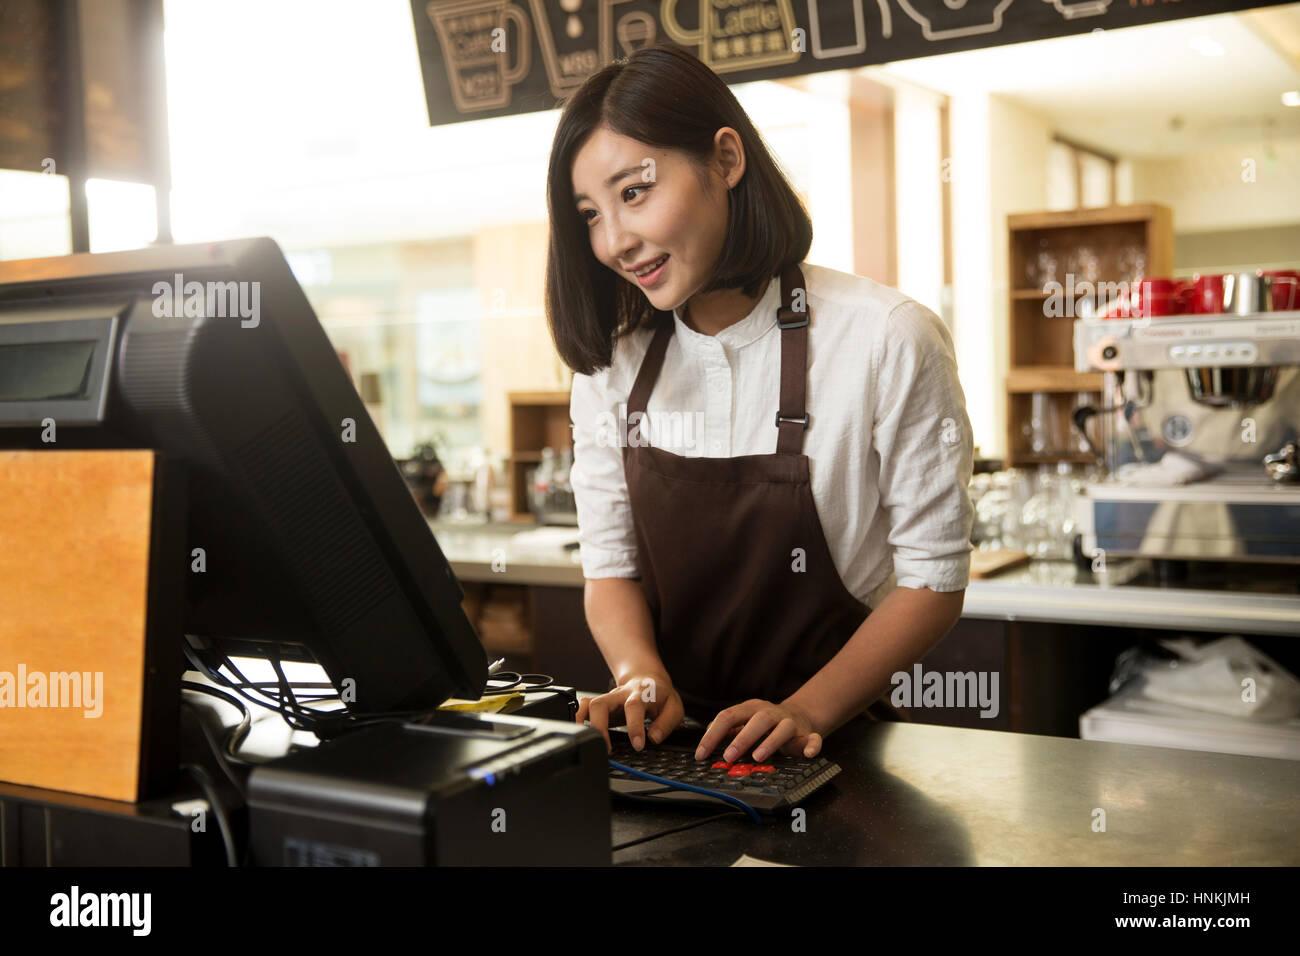 Cafe Cashier Stock Photo 133812129